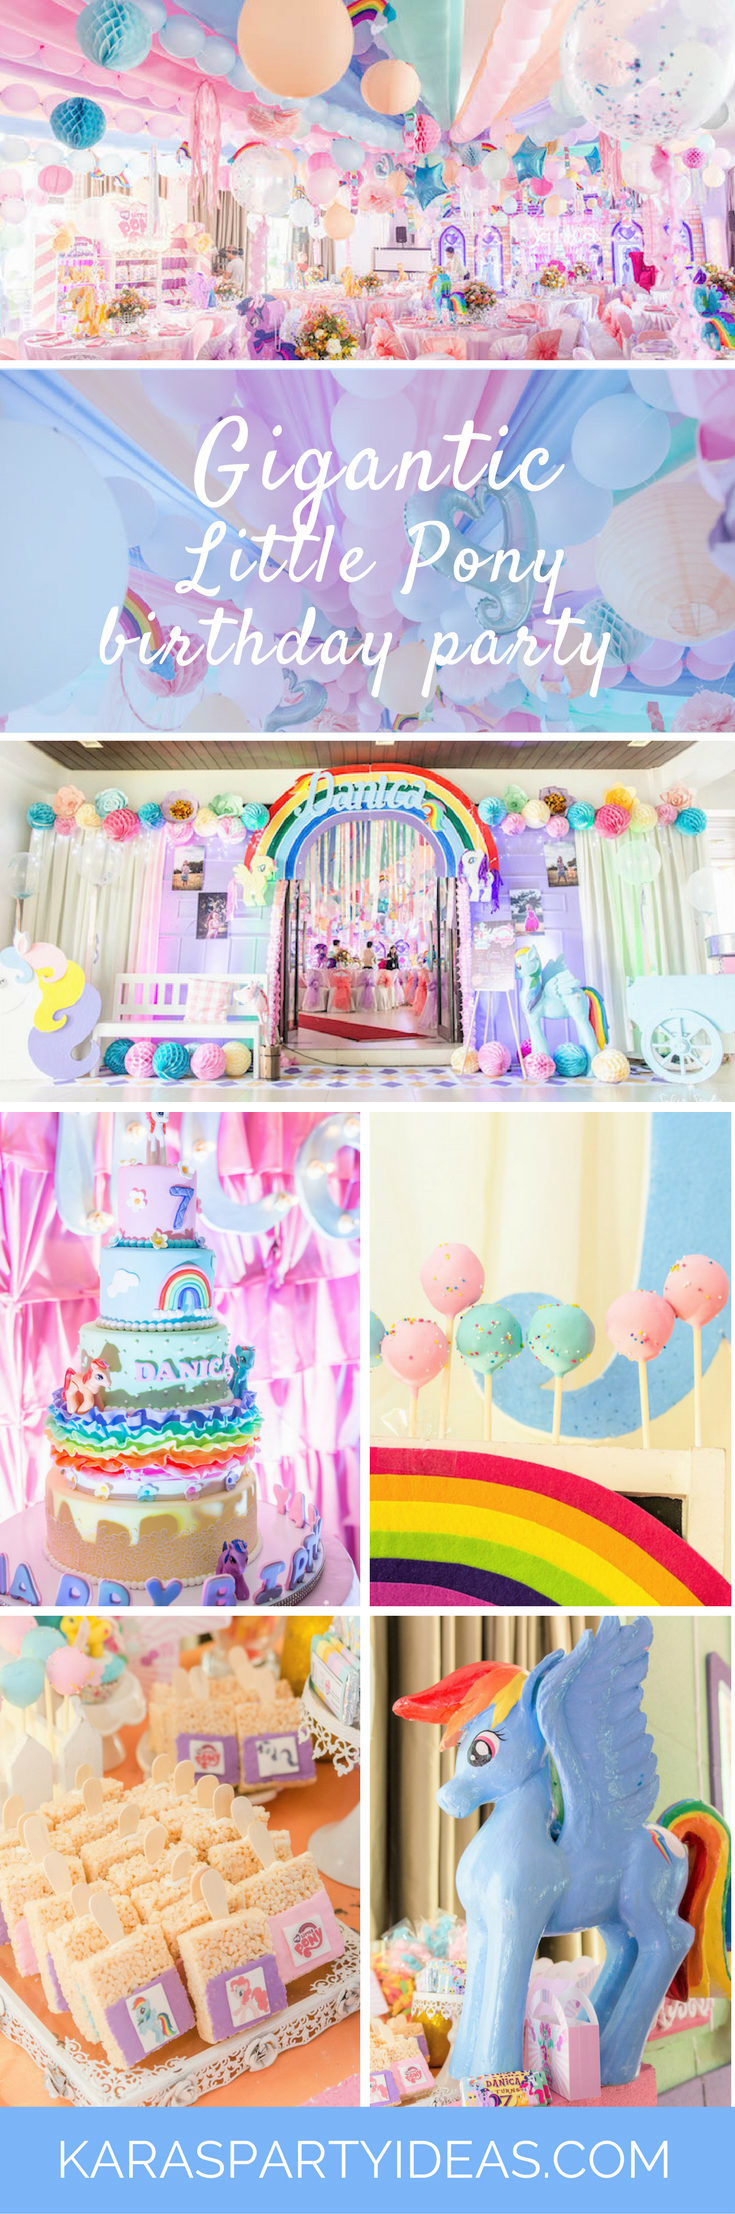 Tea time tea birthday party via kara s party ideas karaspartyideas com - Gigantic Little Pony Birthday Party Karas Party Ideas Via Karaspartyideas Com